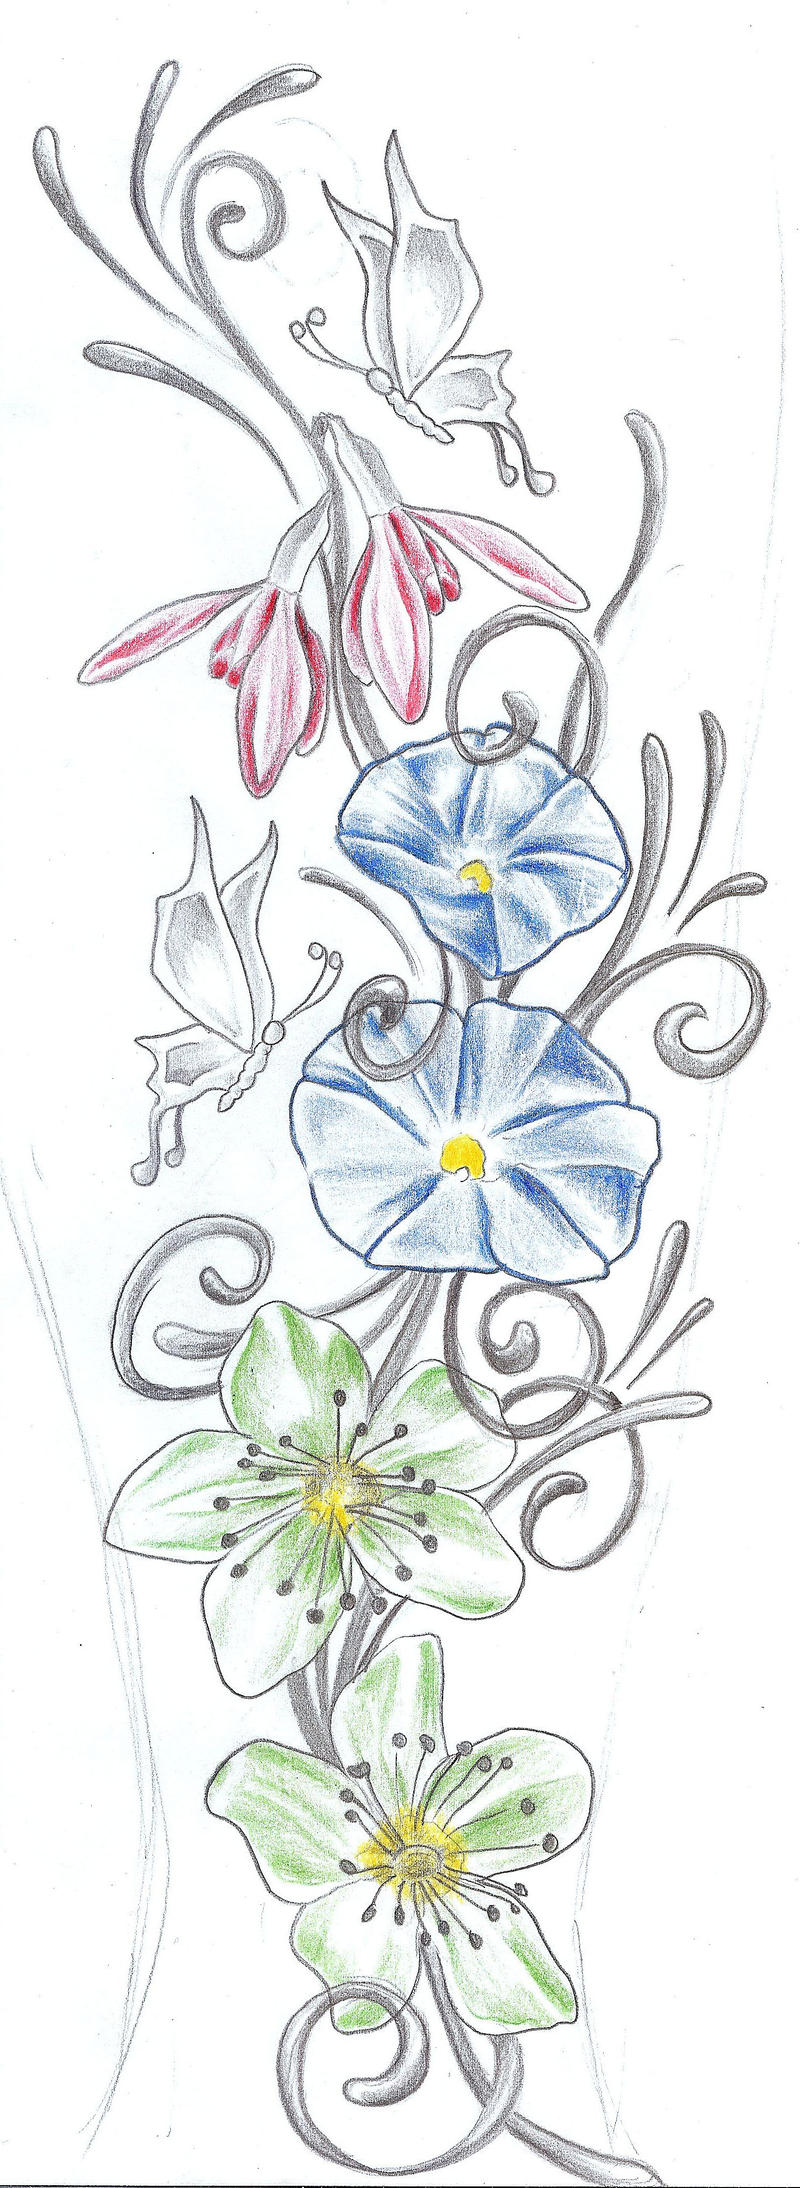 butterflies flowers tat design by 2face tattoo on deviantart. Black Bedroom Furniture Sets. Home Design Ideas